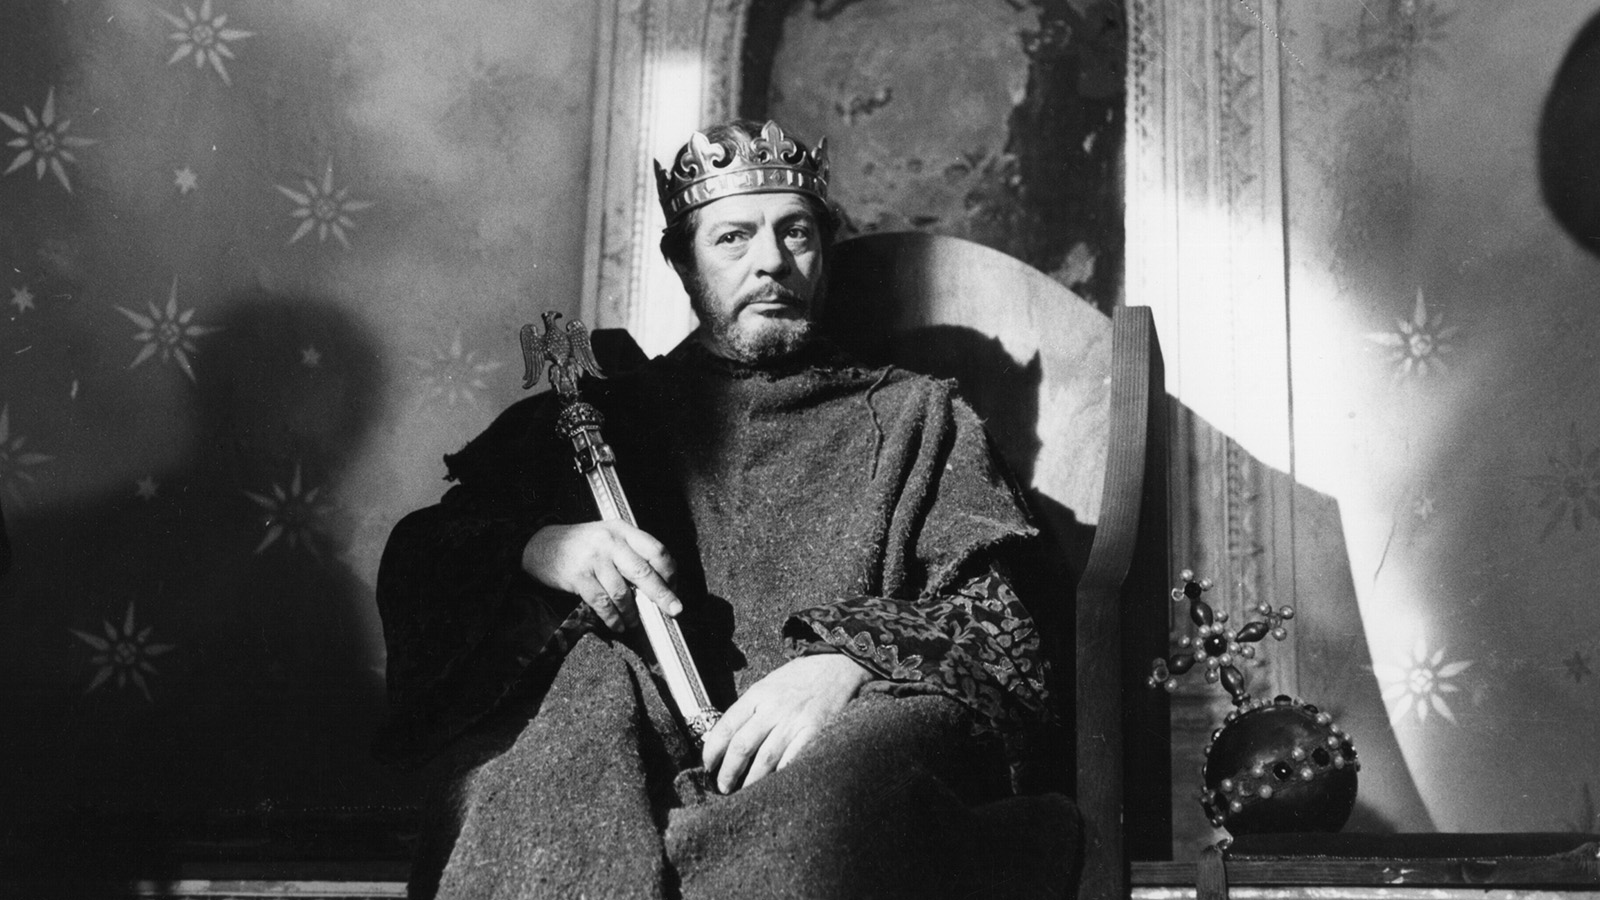 [Henry IV] Henry IV, 1984, ©Orion Classics/Photofest.